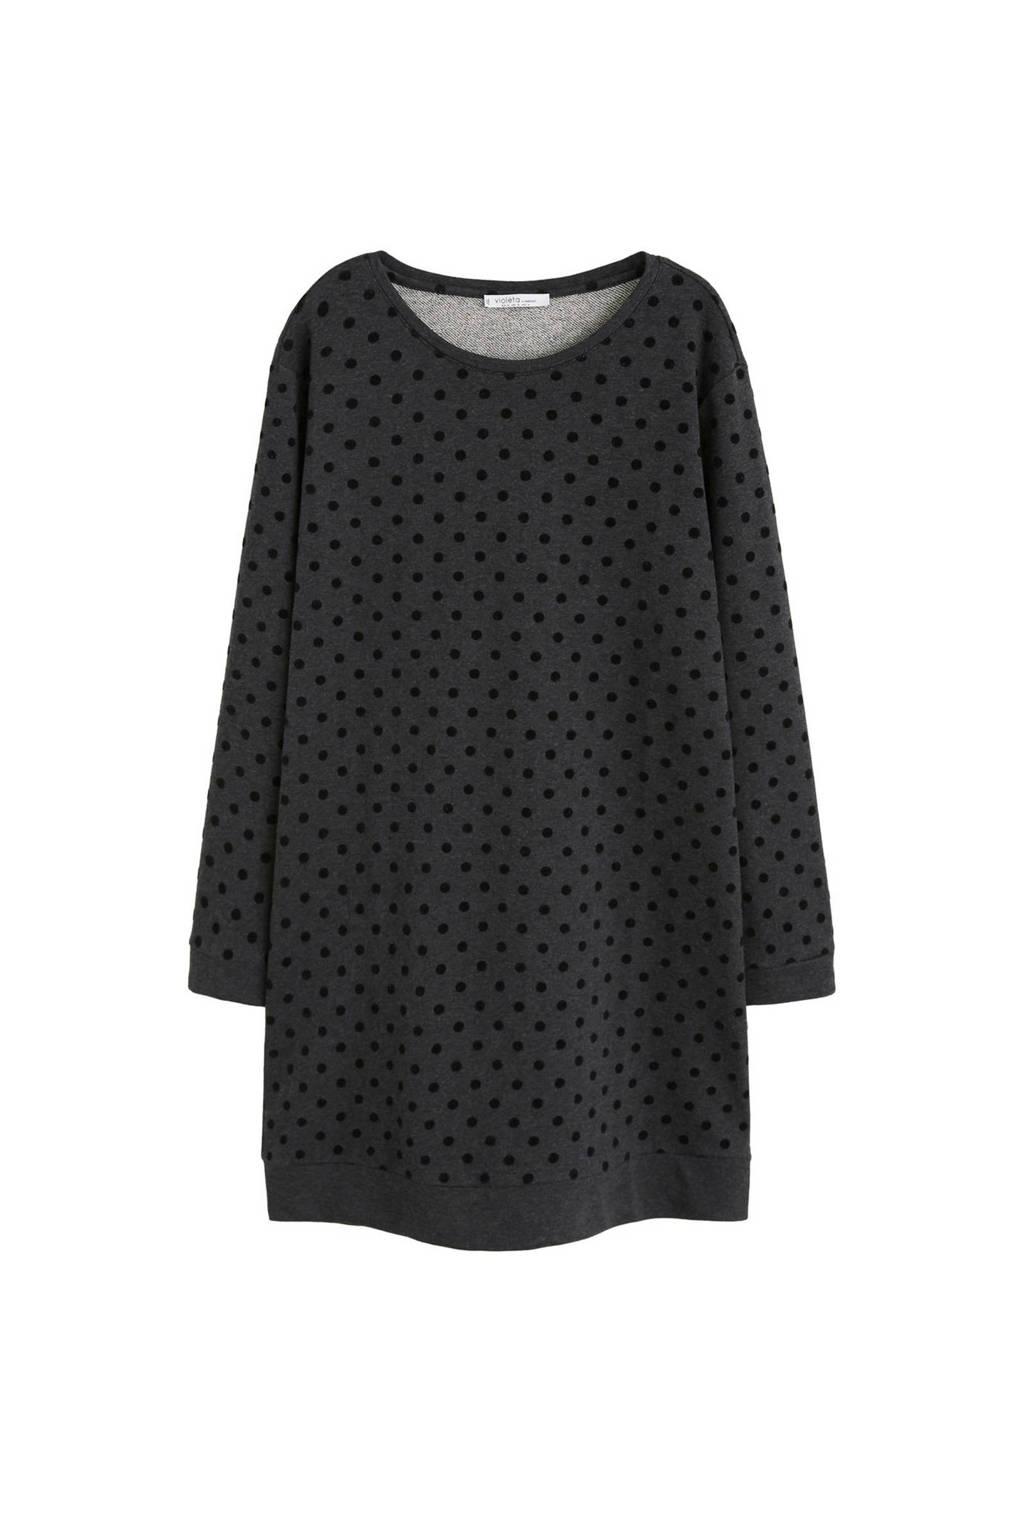 Violeta by Mango jurk met stippenprint donkergrijs, Donkergrijs